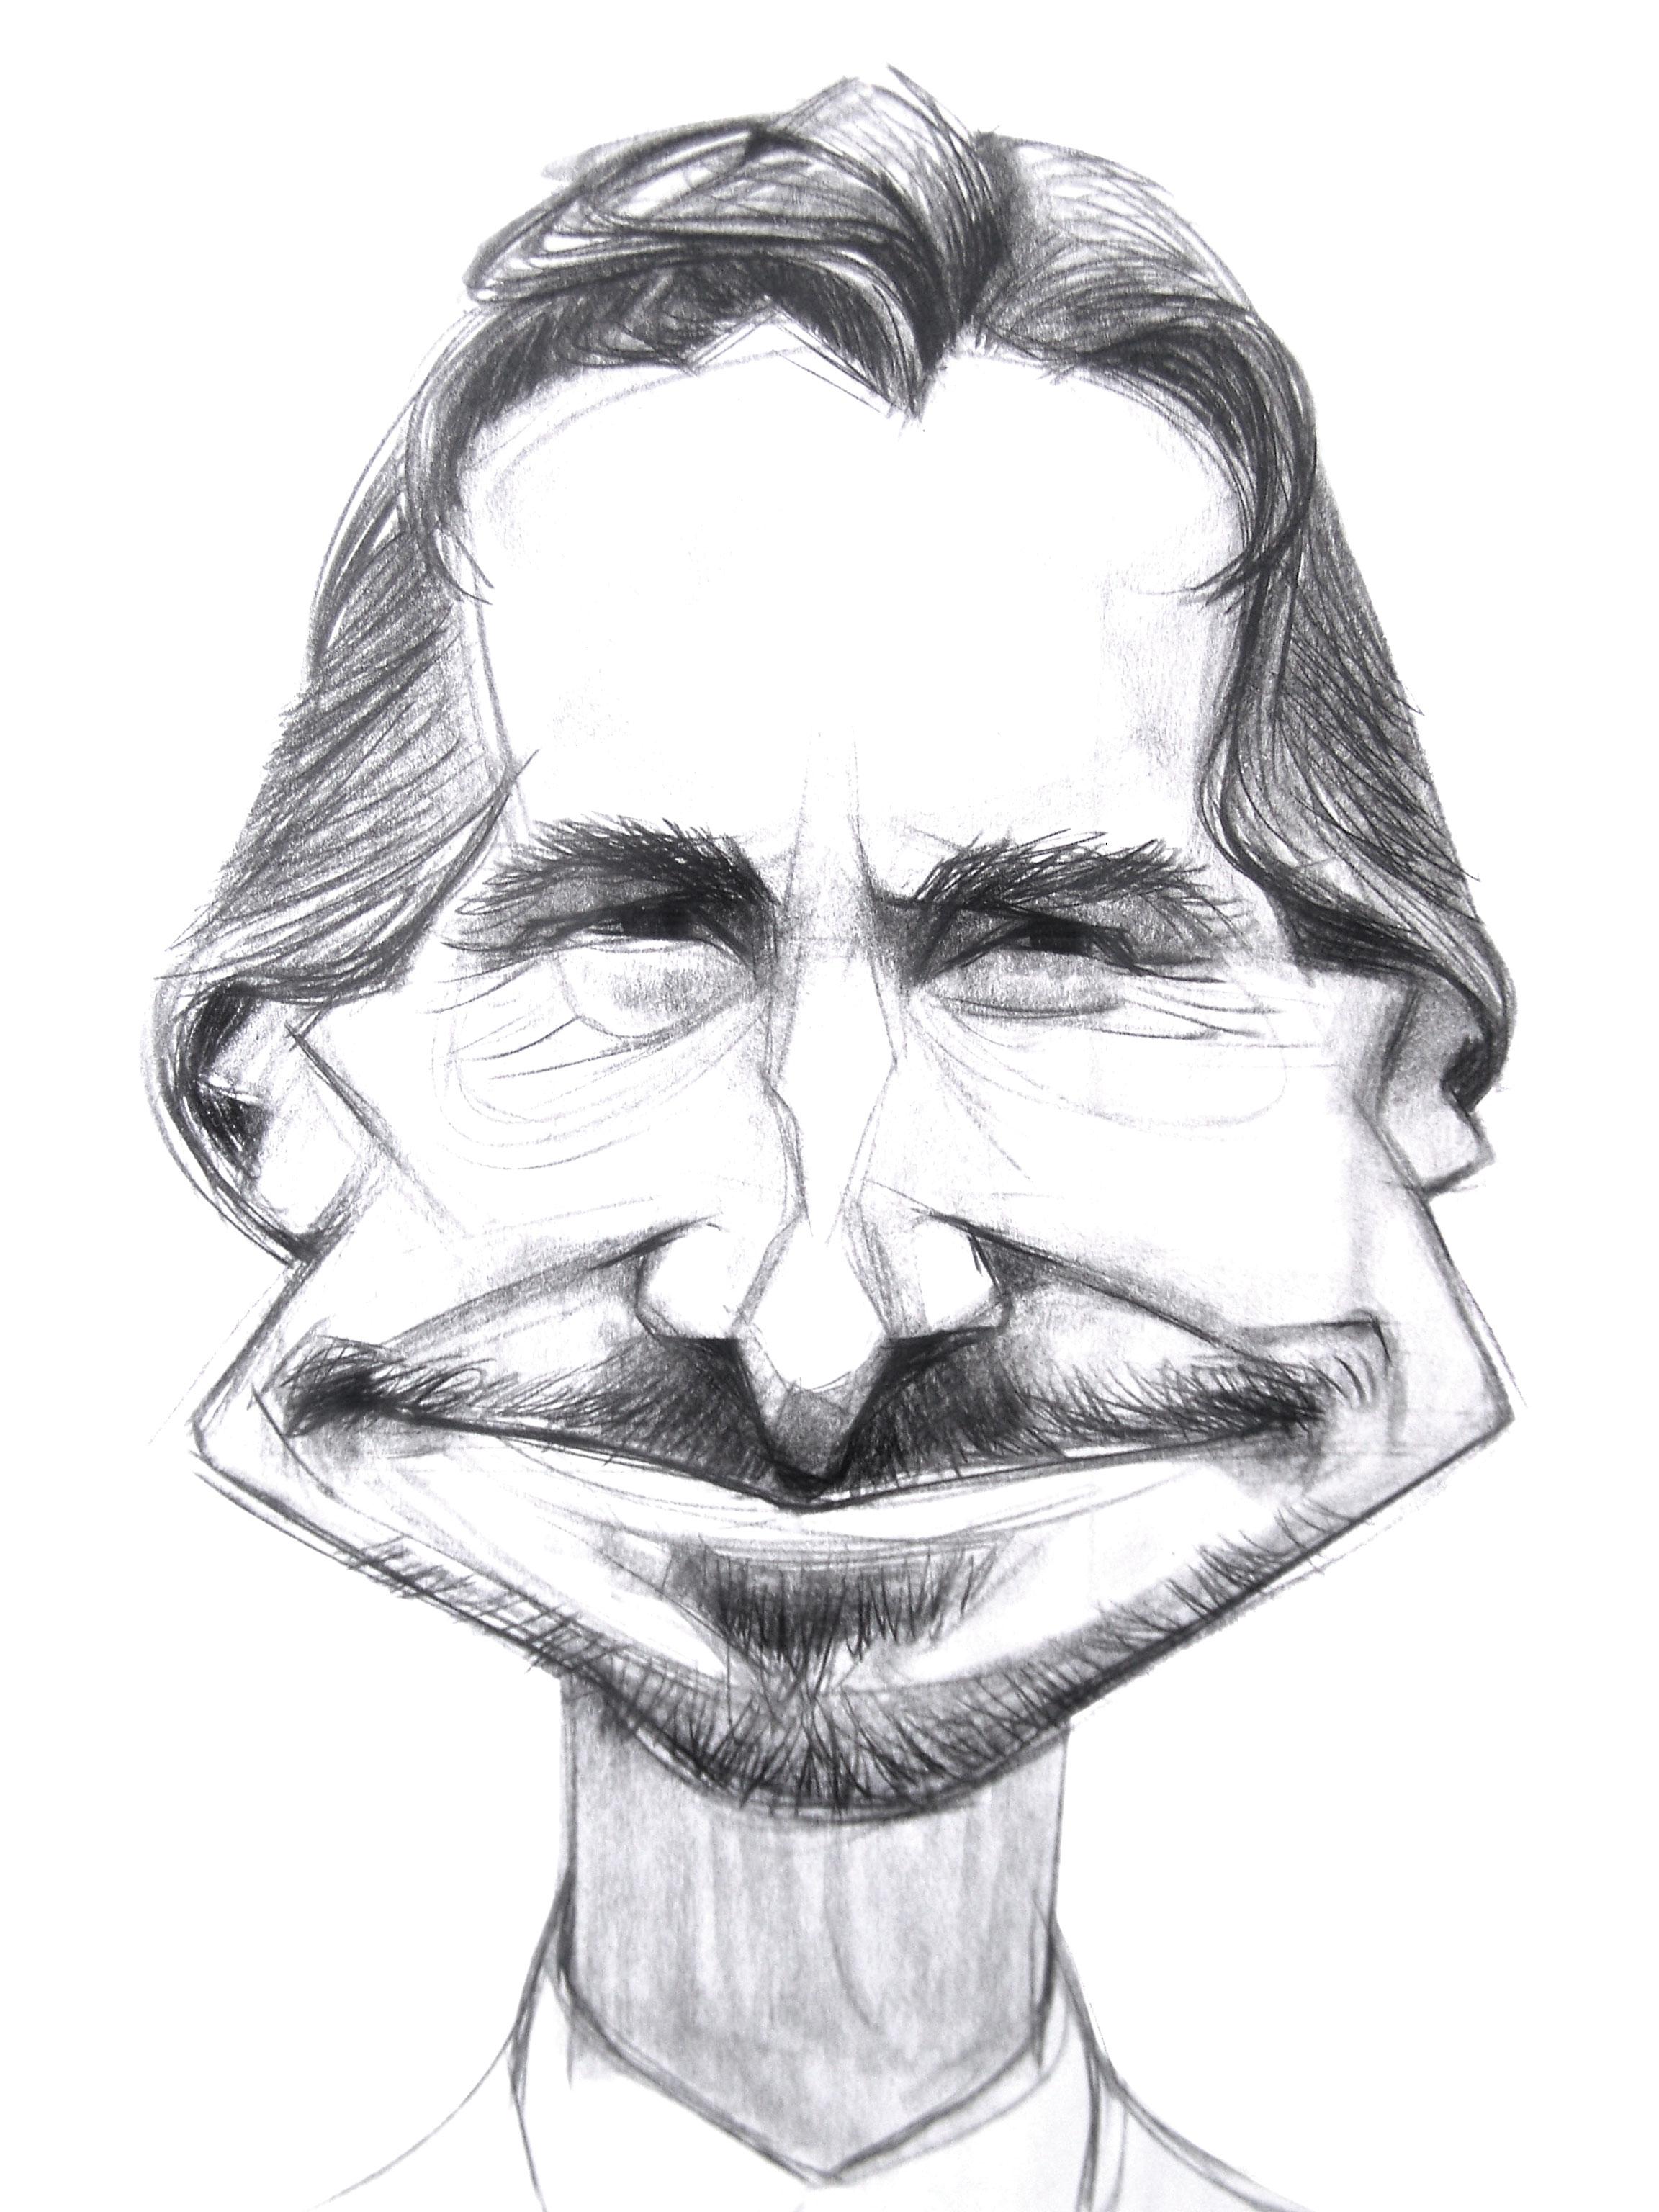 Christian Bale-digital sketches Showflipper